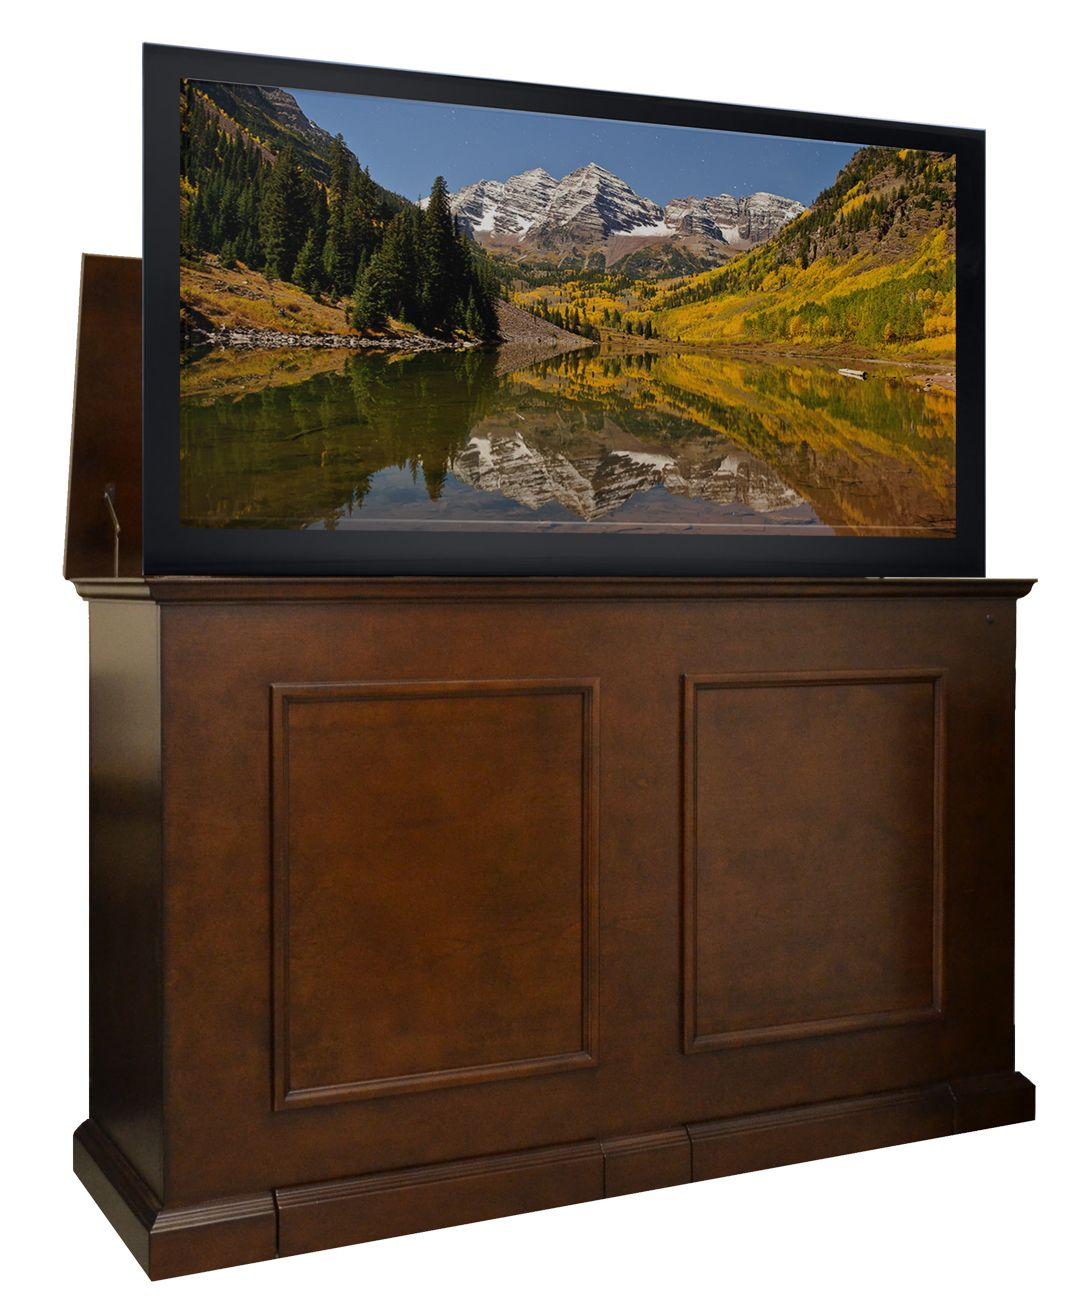 grand elevate 74008 espresso tv lift cabinet for 65 flat screen tvs rh pinterest com